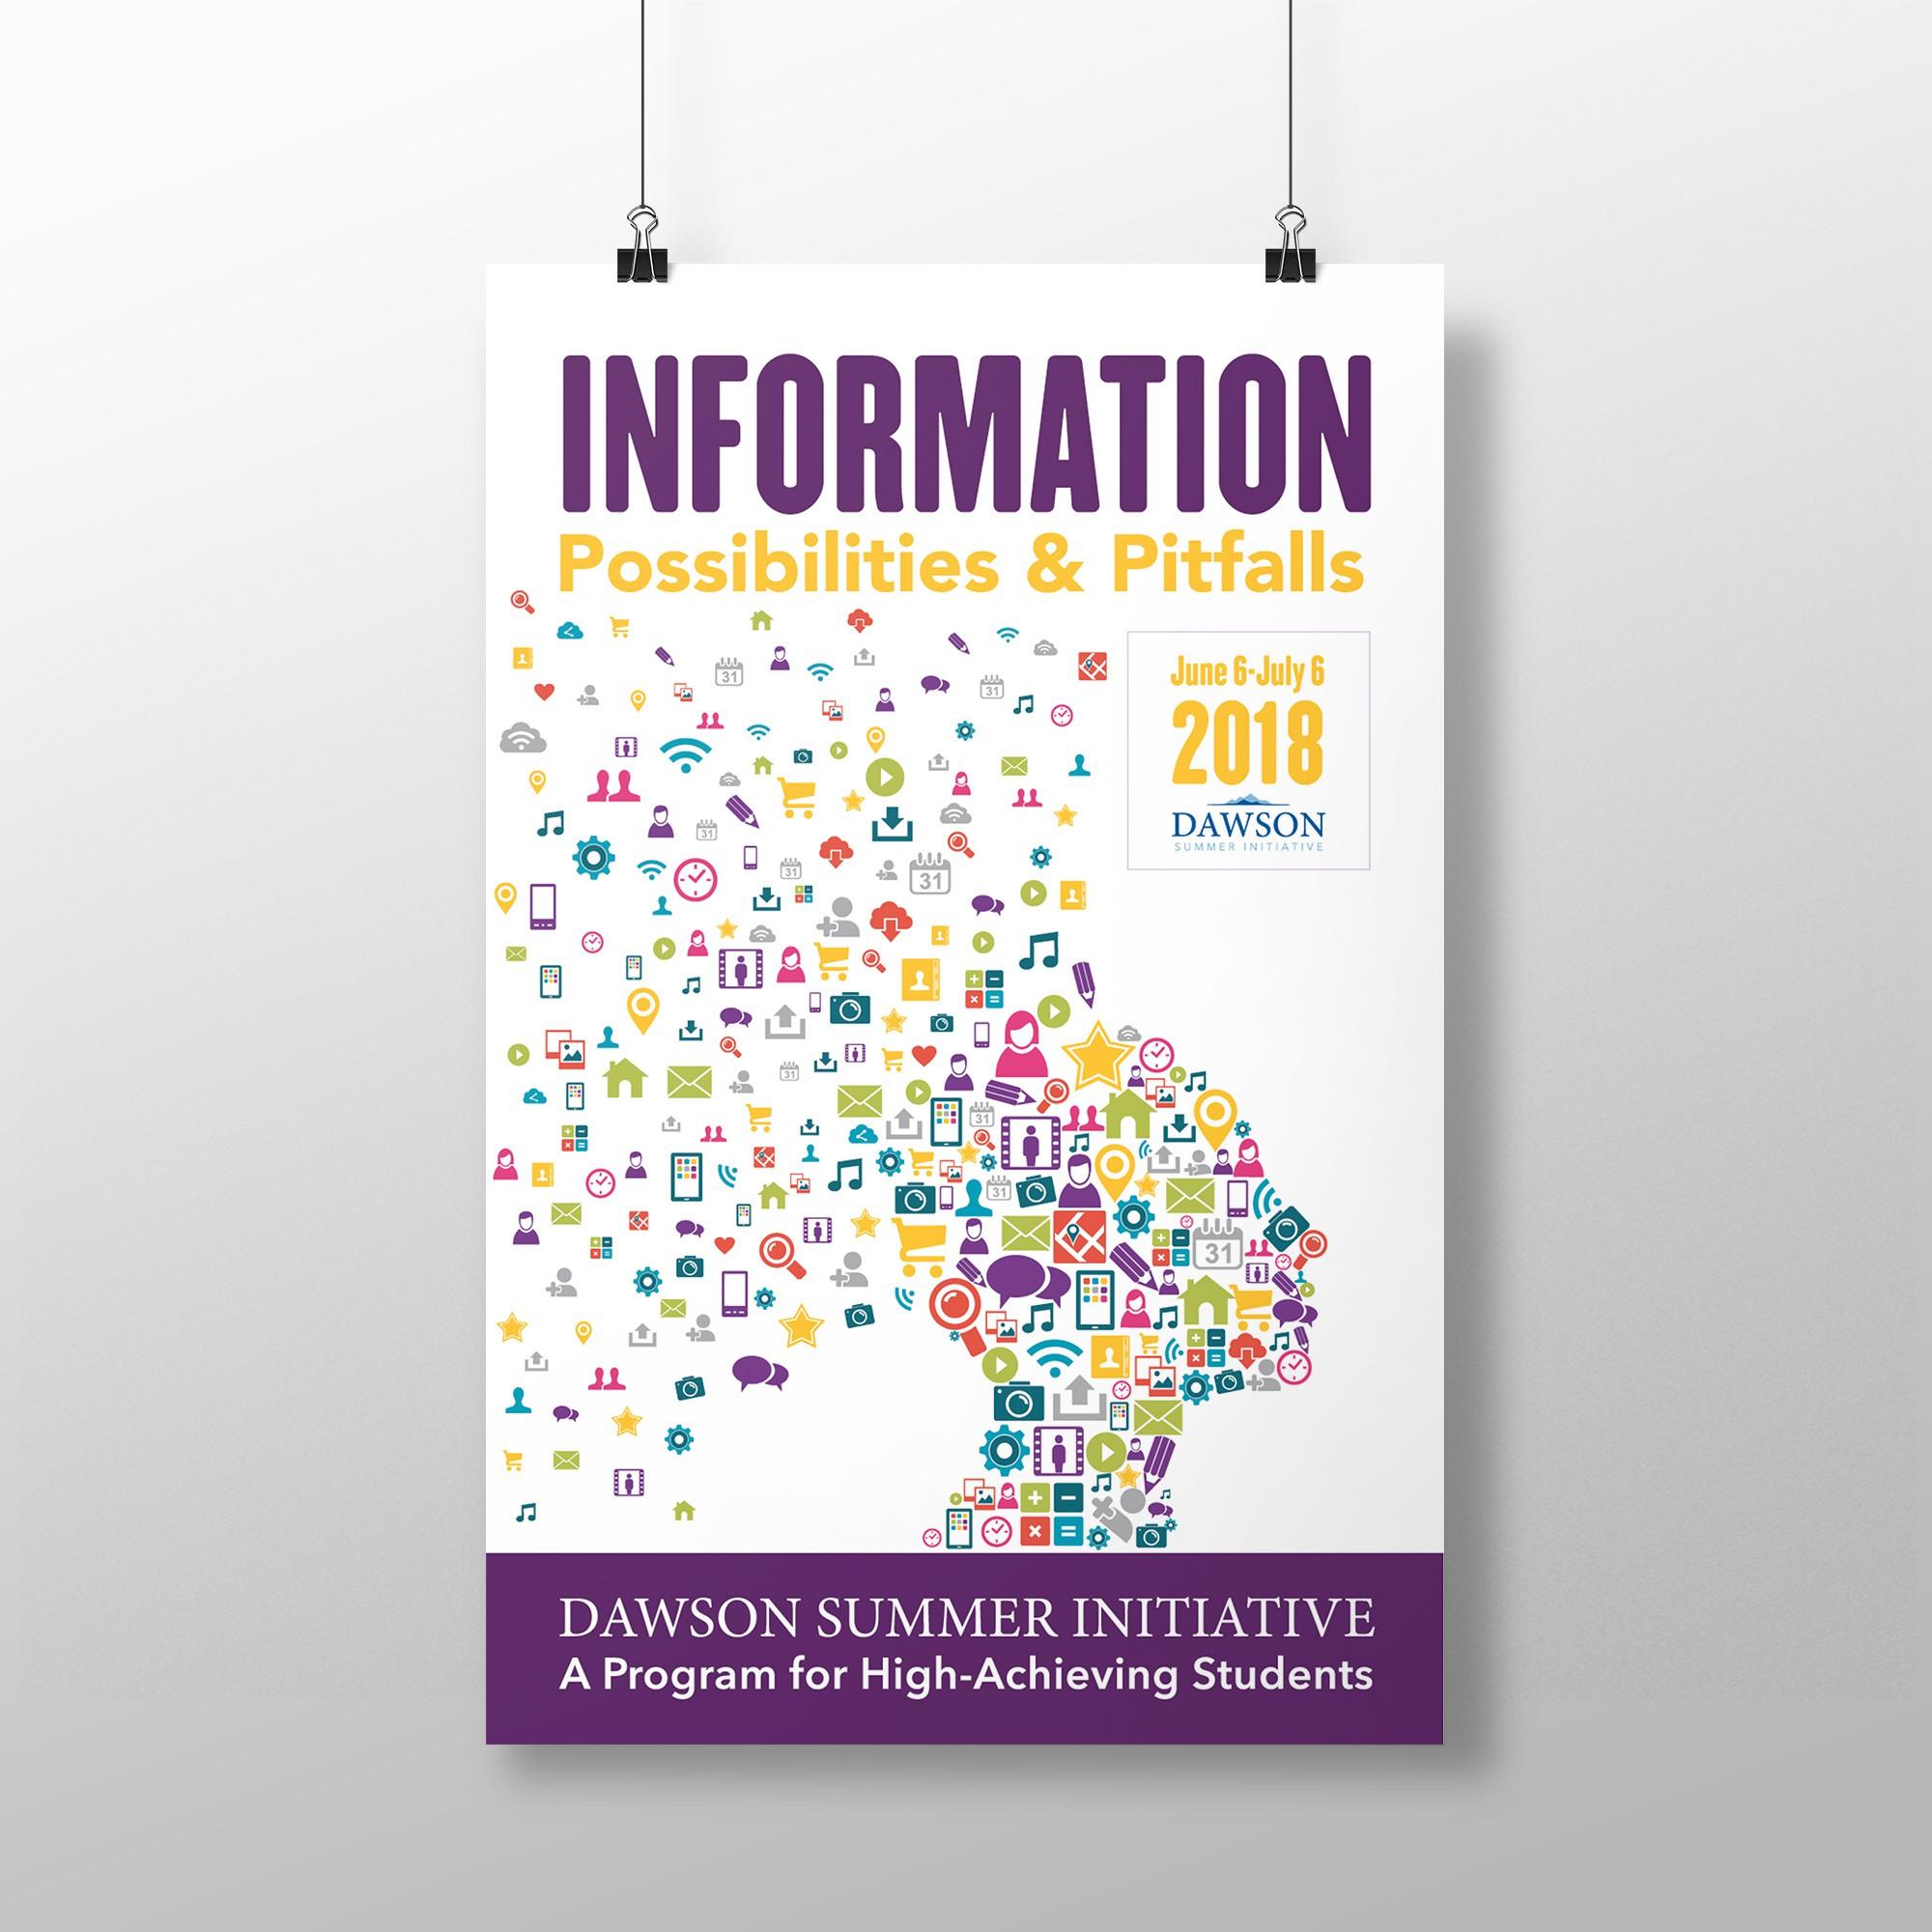 Dawson Summer Initiative: poster for Summer 2018